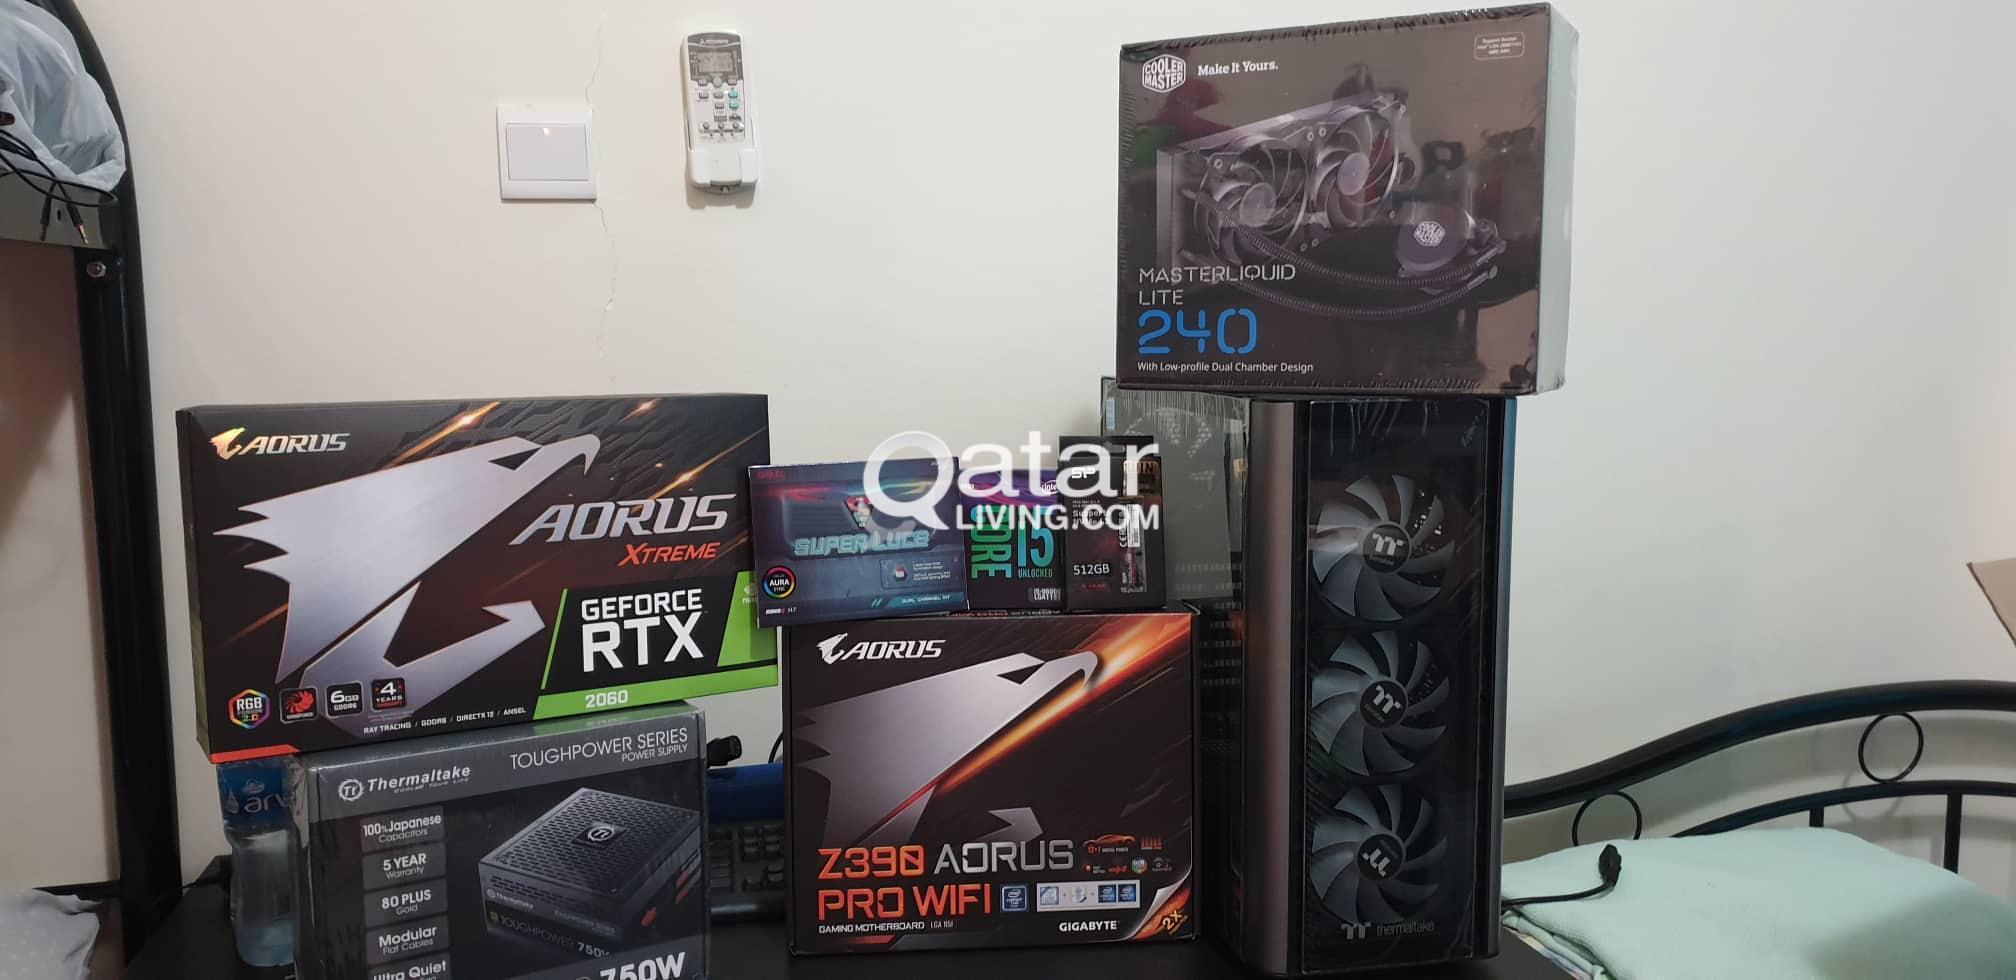 Gaming Computer Parts (Rtx 2060 / i5 9600k) | Qatar Living